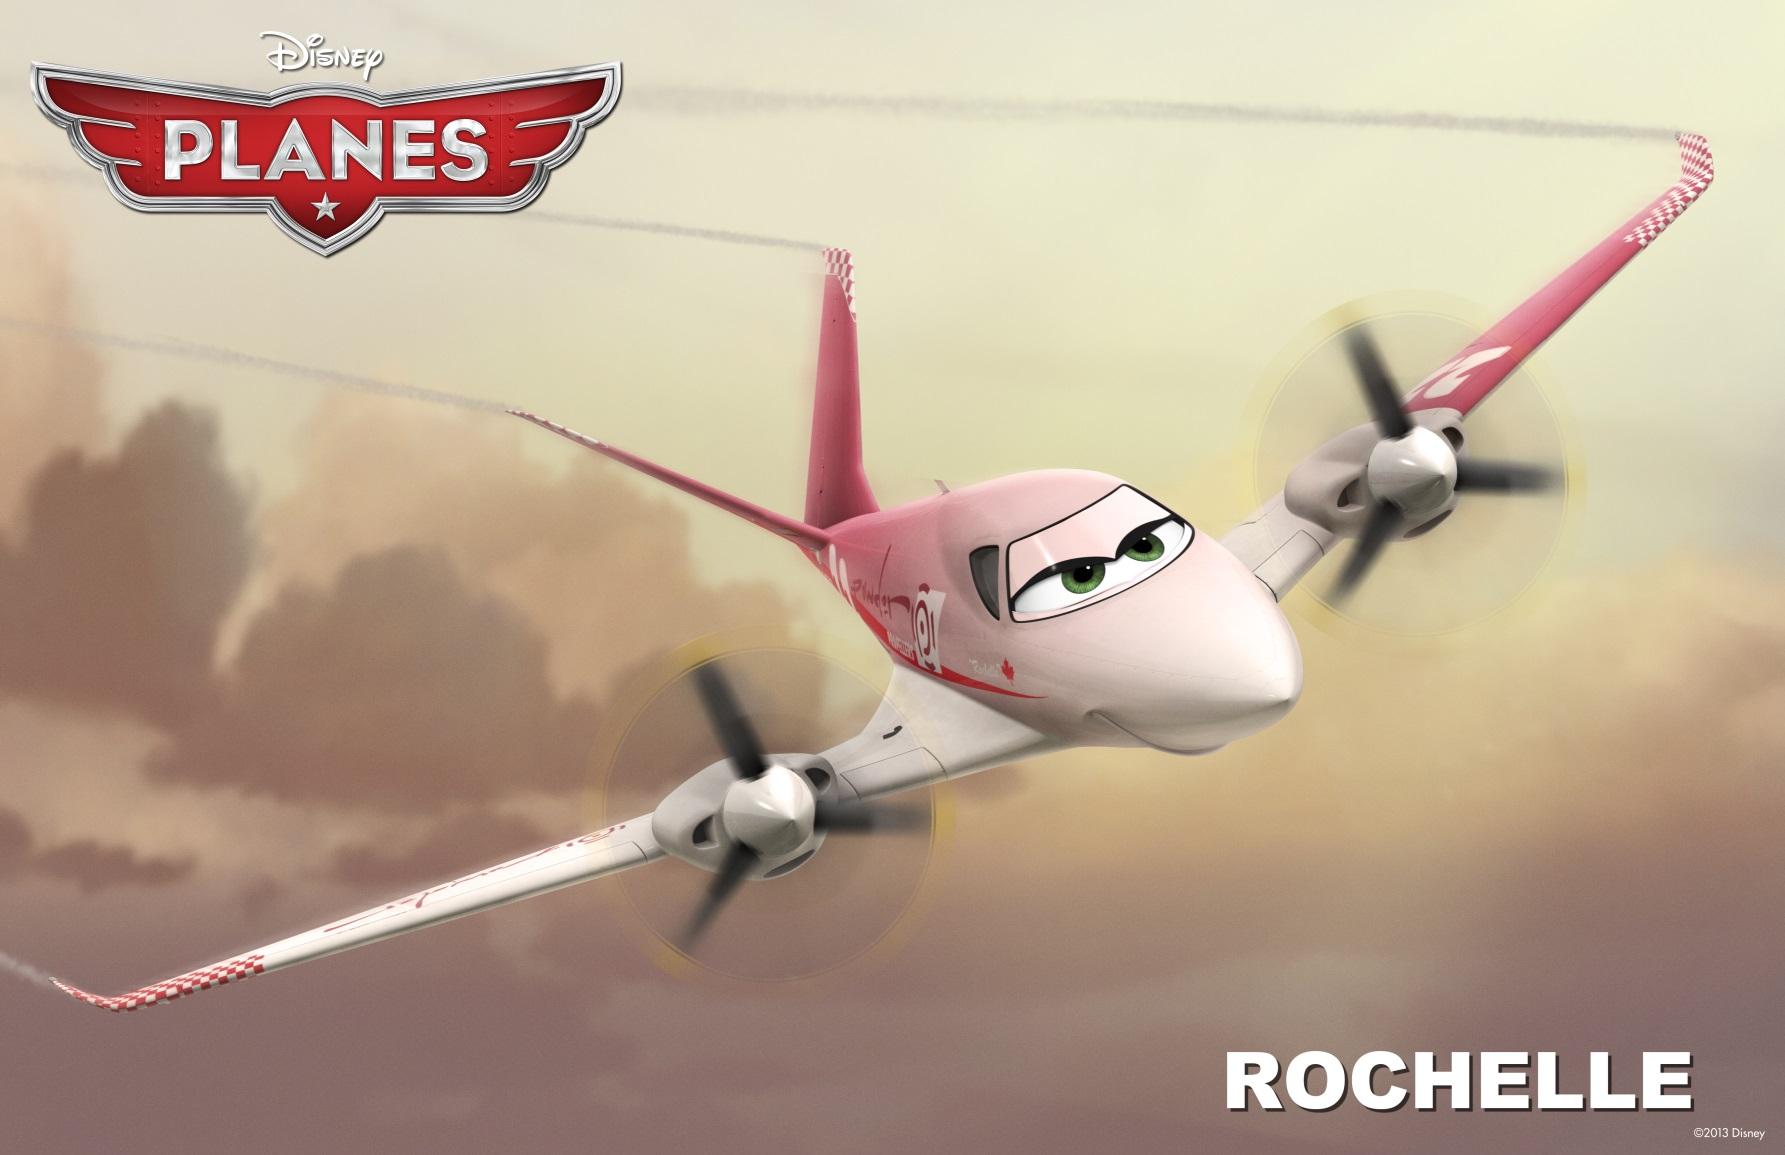 Planes film Disney - Rochelle -Disneytoon - Personaggi - Planes Disney Wiki - Planes Disney Film